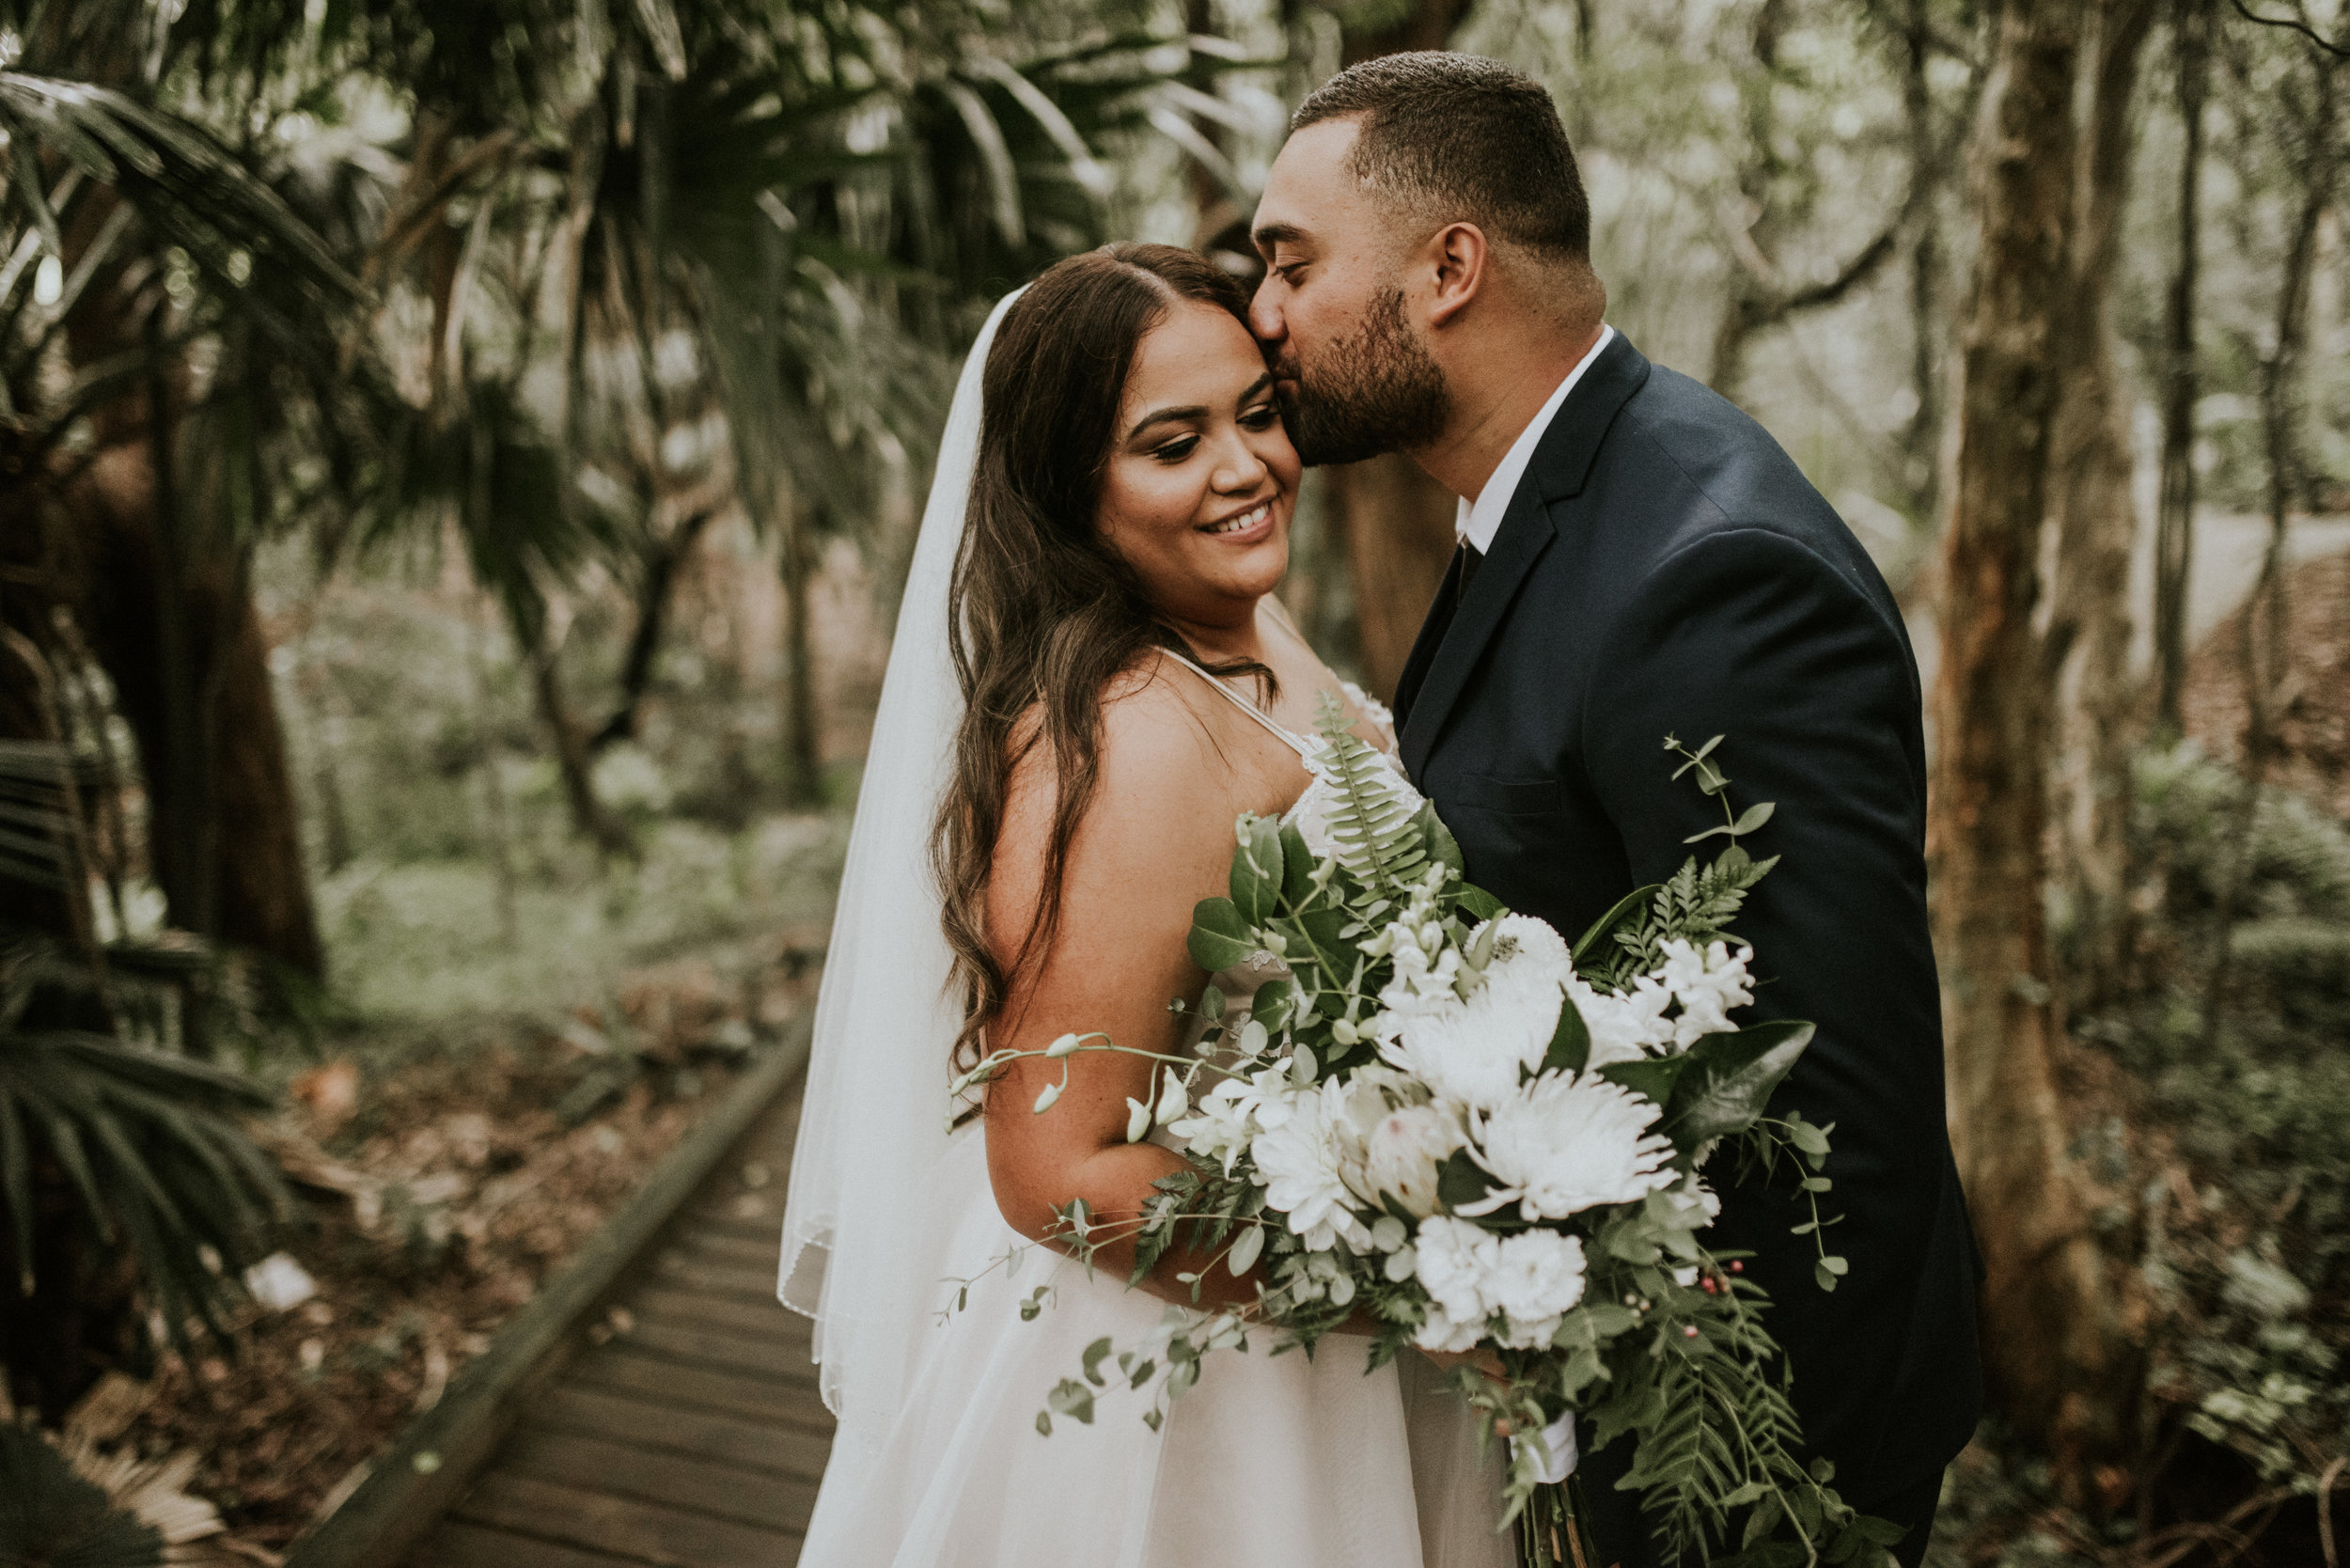 Ingrid & Situa - Panorama House, Autumn Wollongong Wedding    24th March 2018